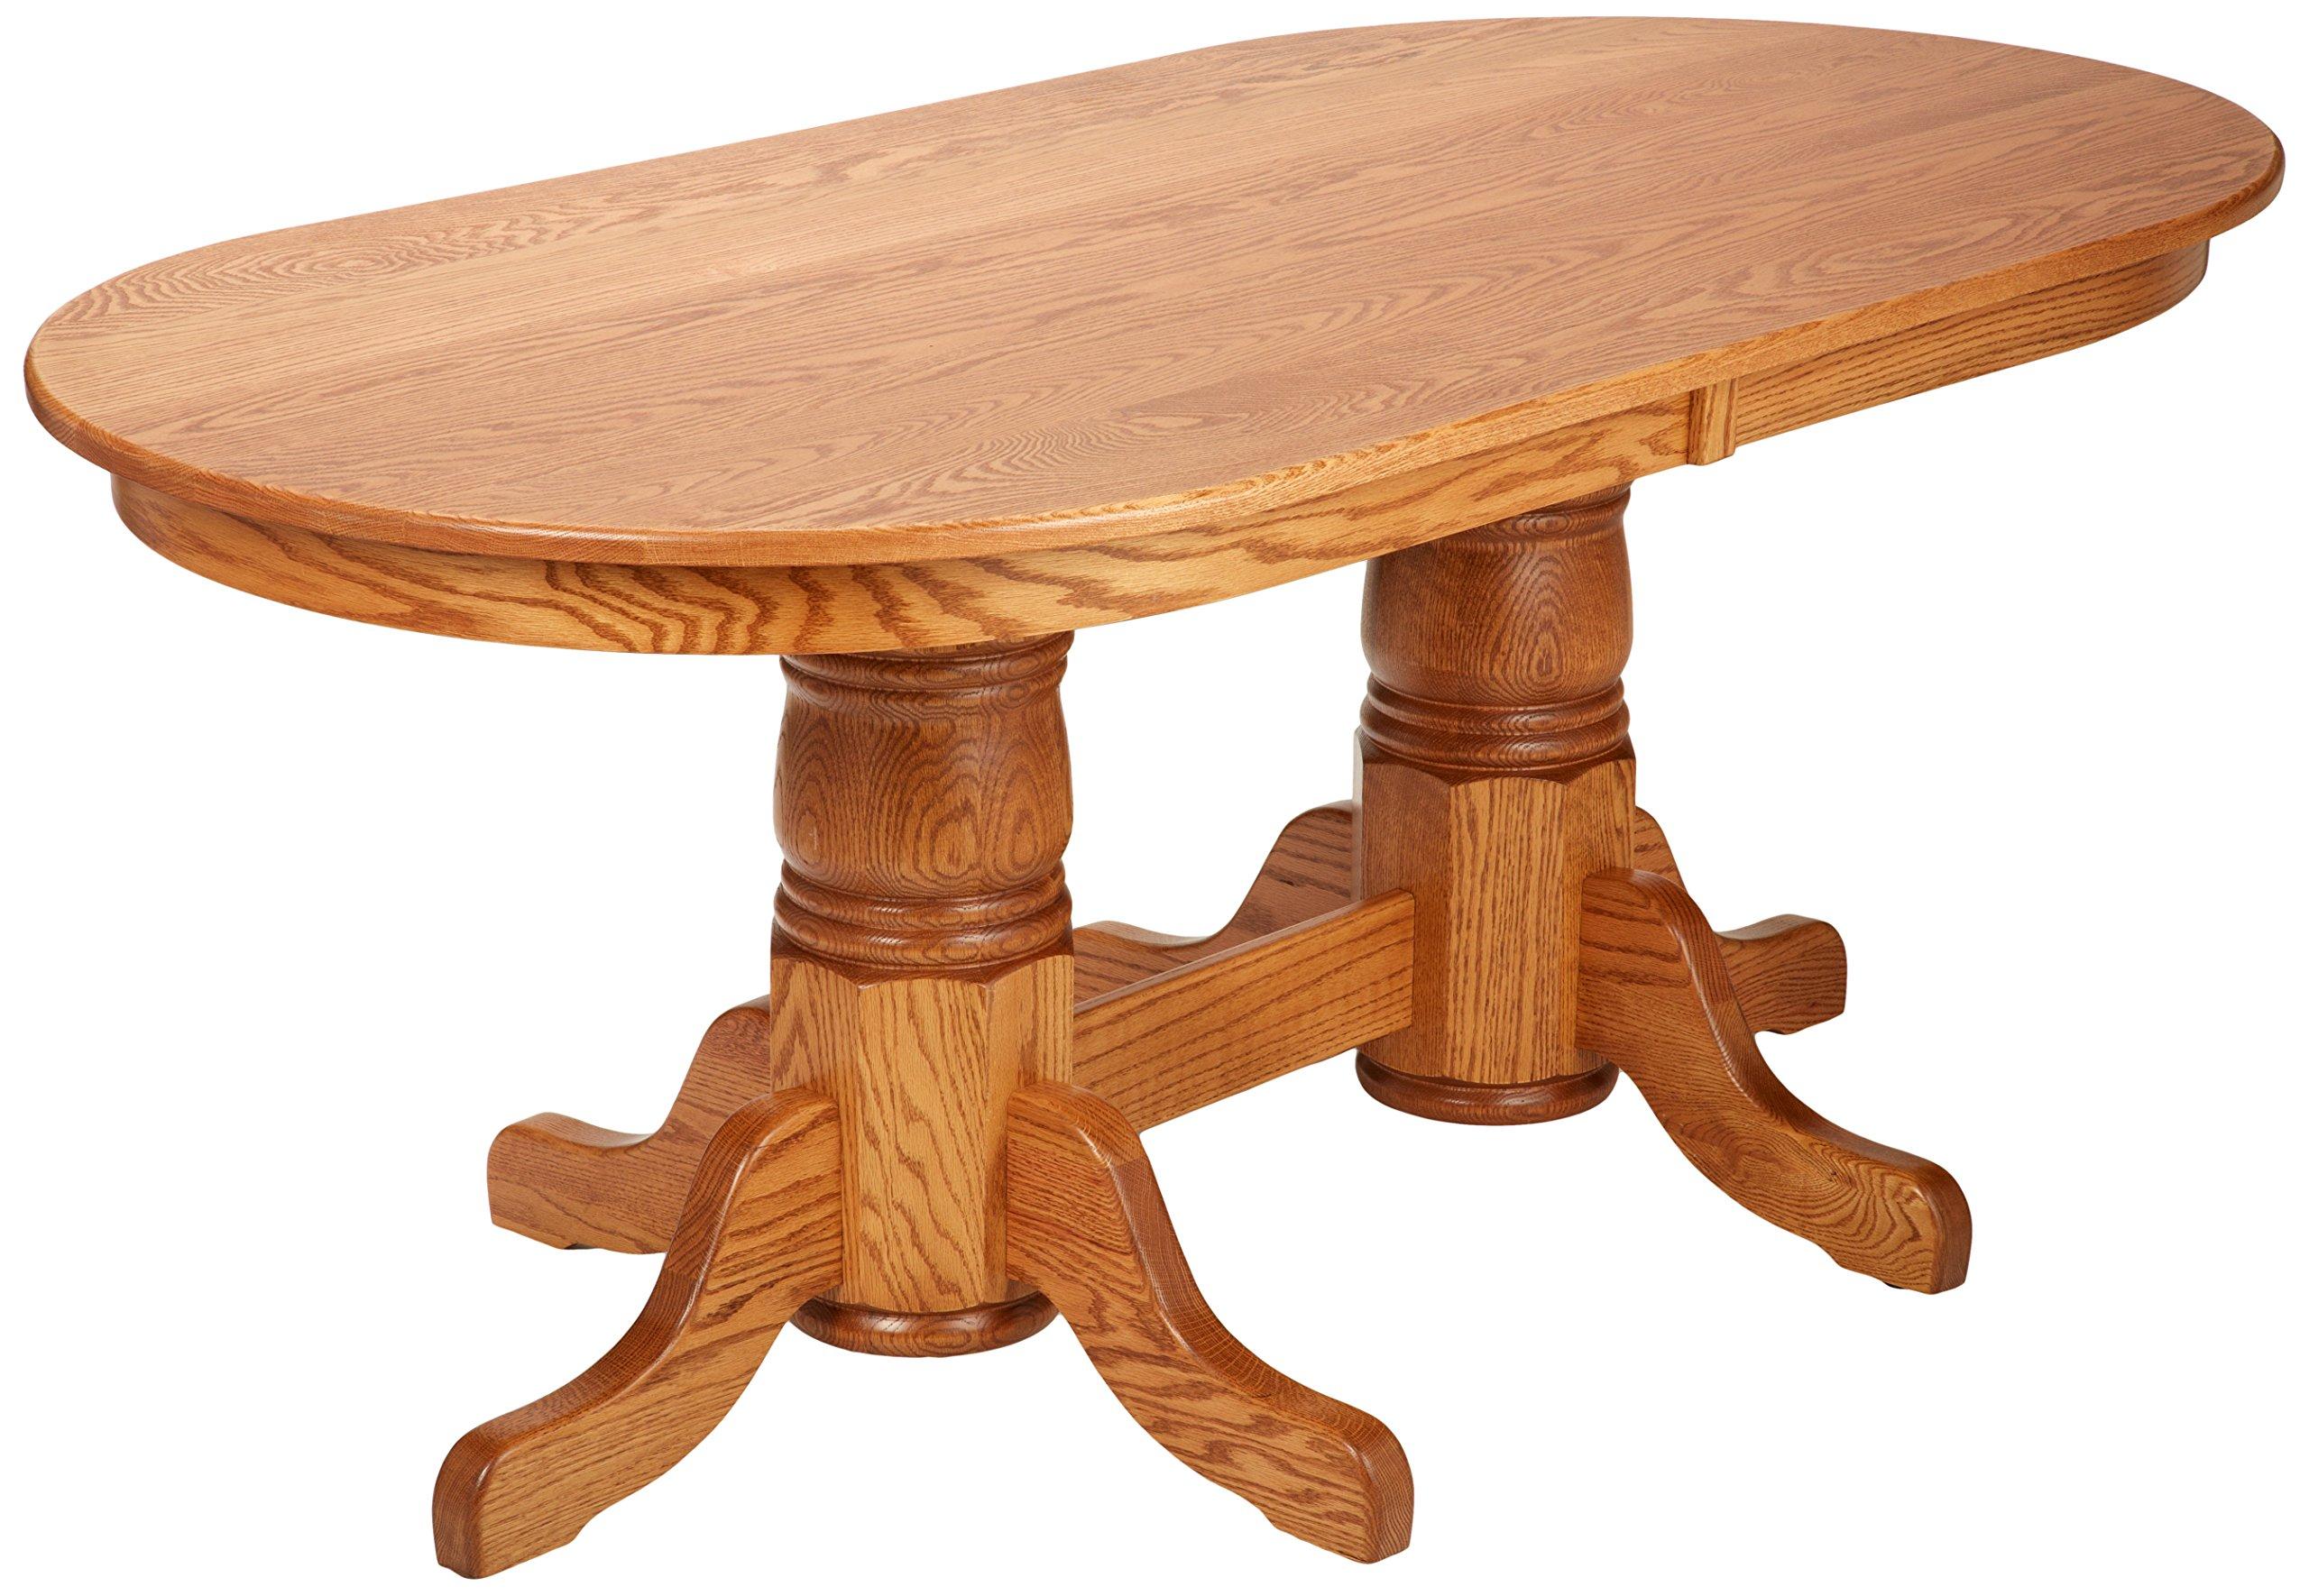 Dooley's EN7236DBD-3 Solid Oak Double Pedestal Oval Dining Table, 72'' Length x 36'' Width x 30'' Height, Early American Finish